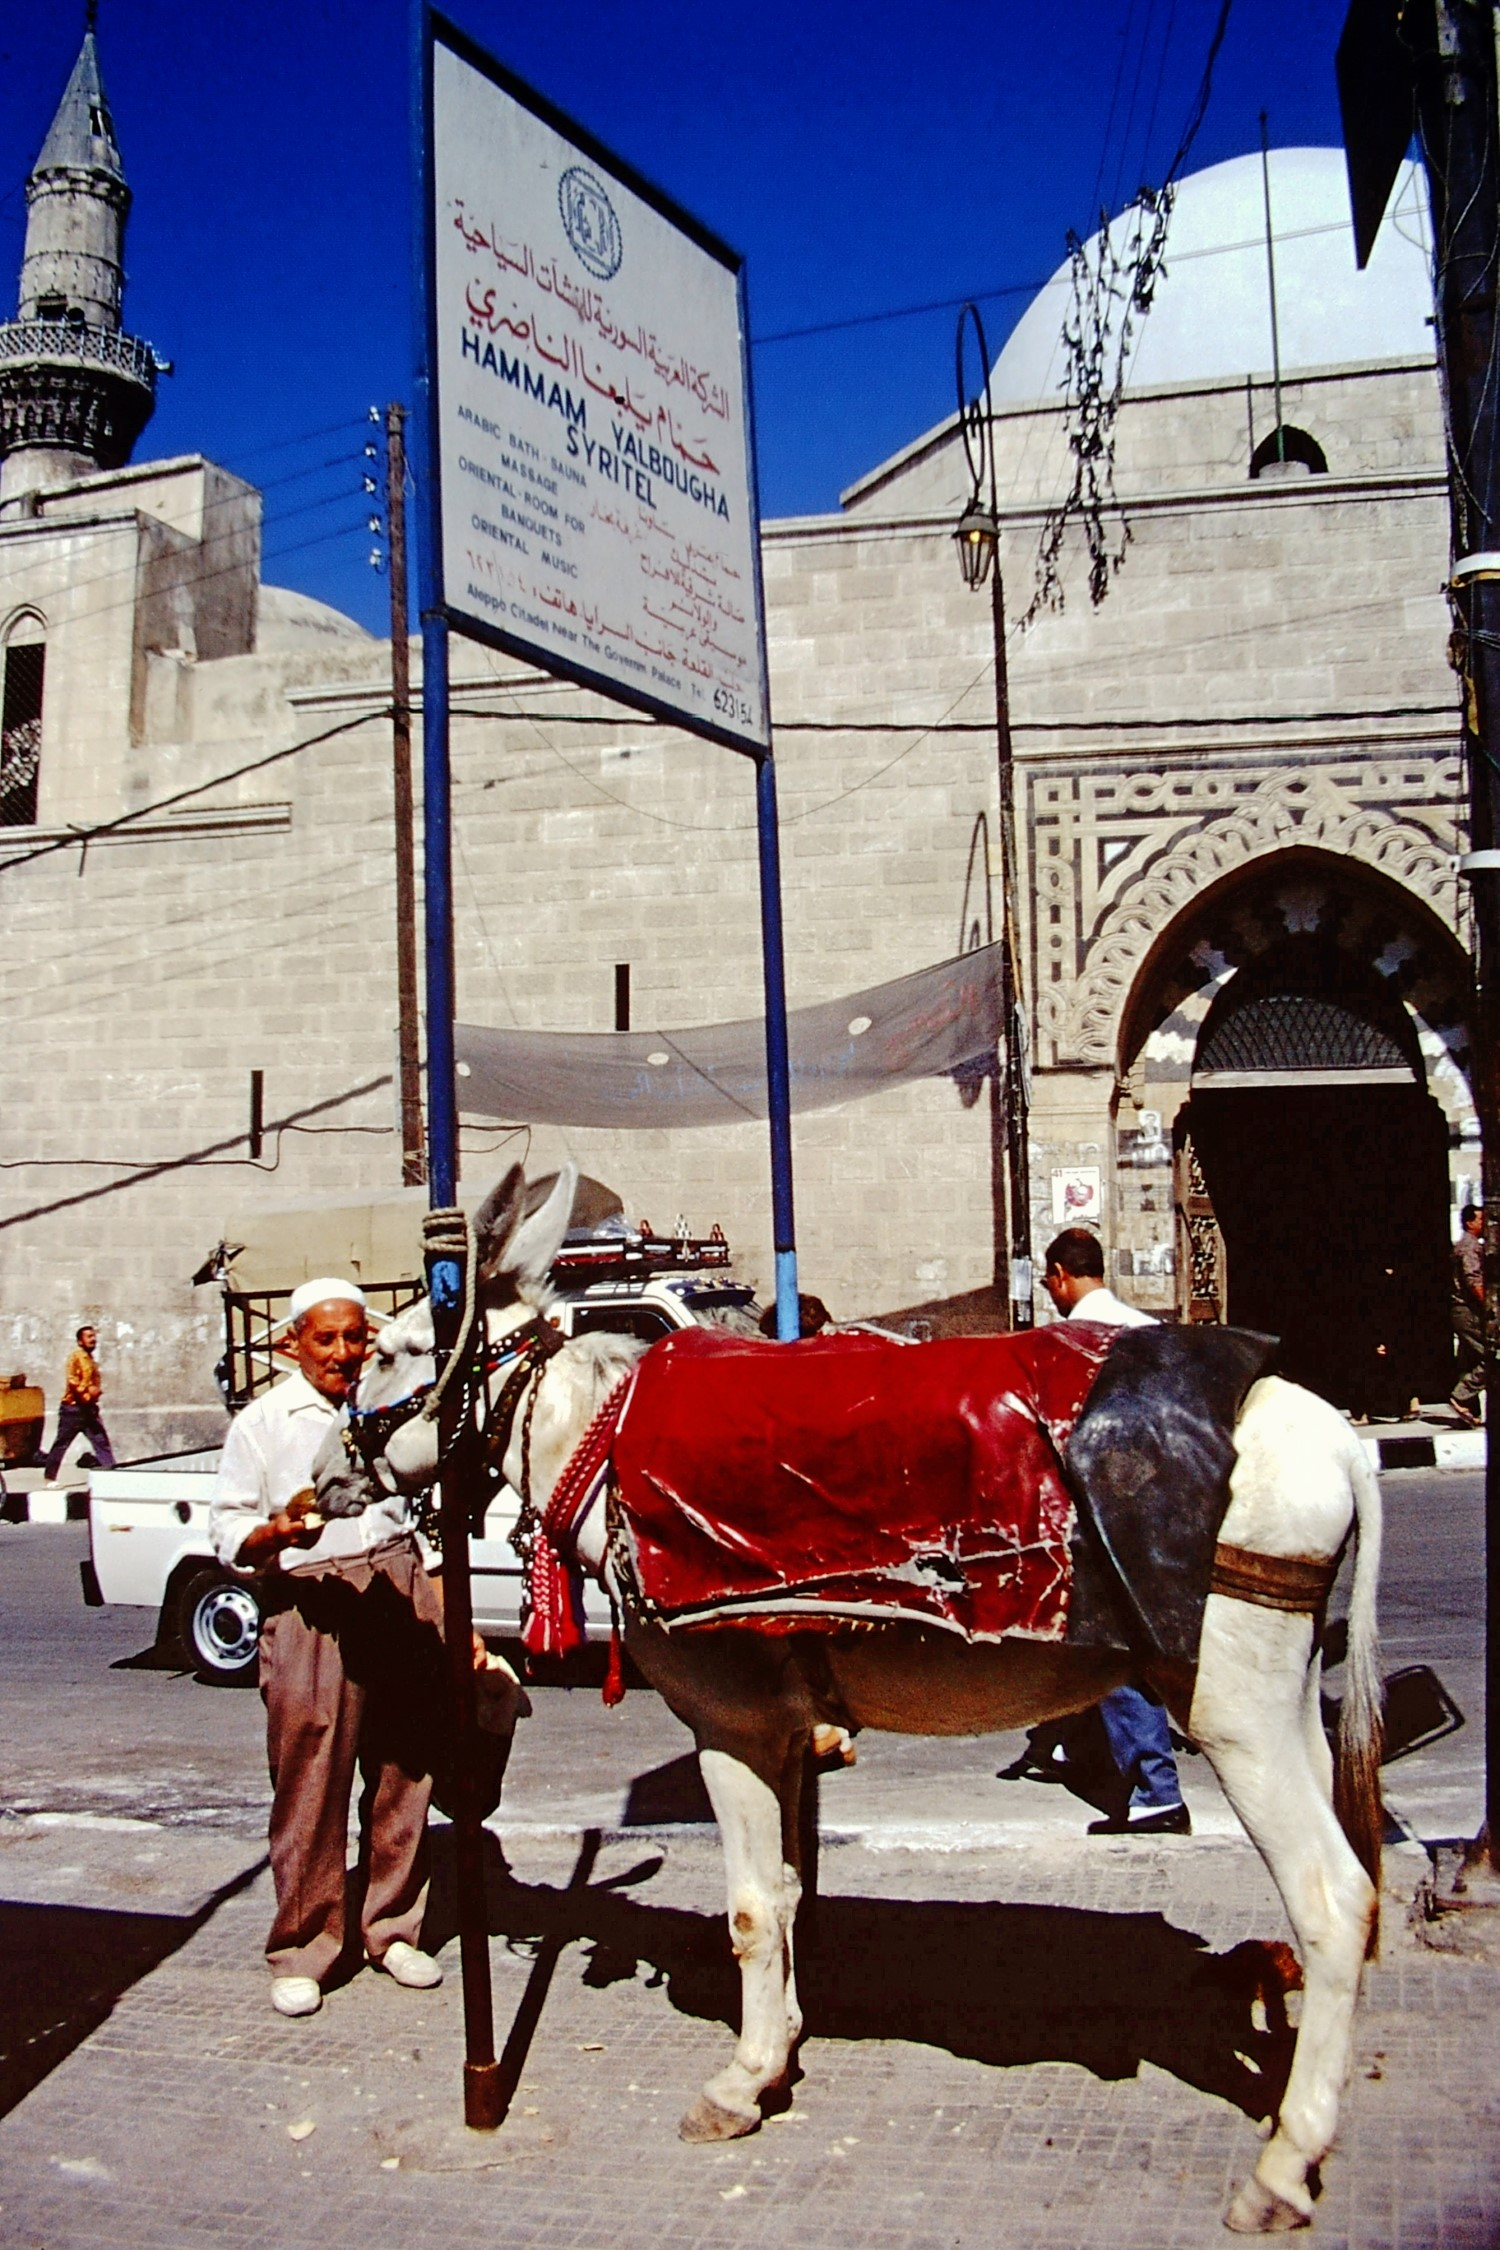 Man with donkey on a city street